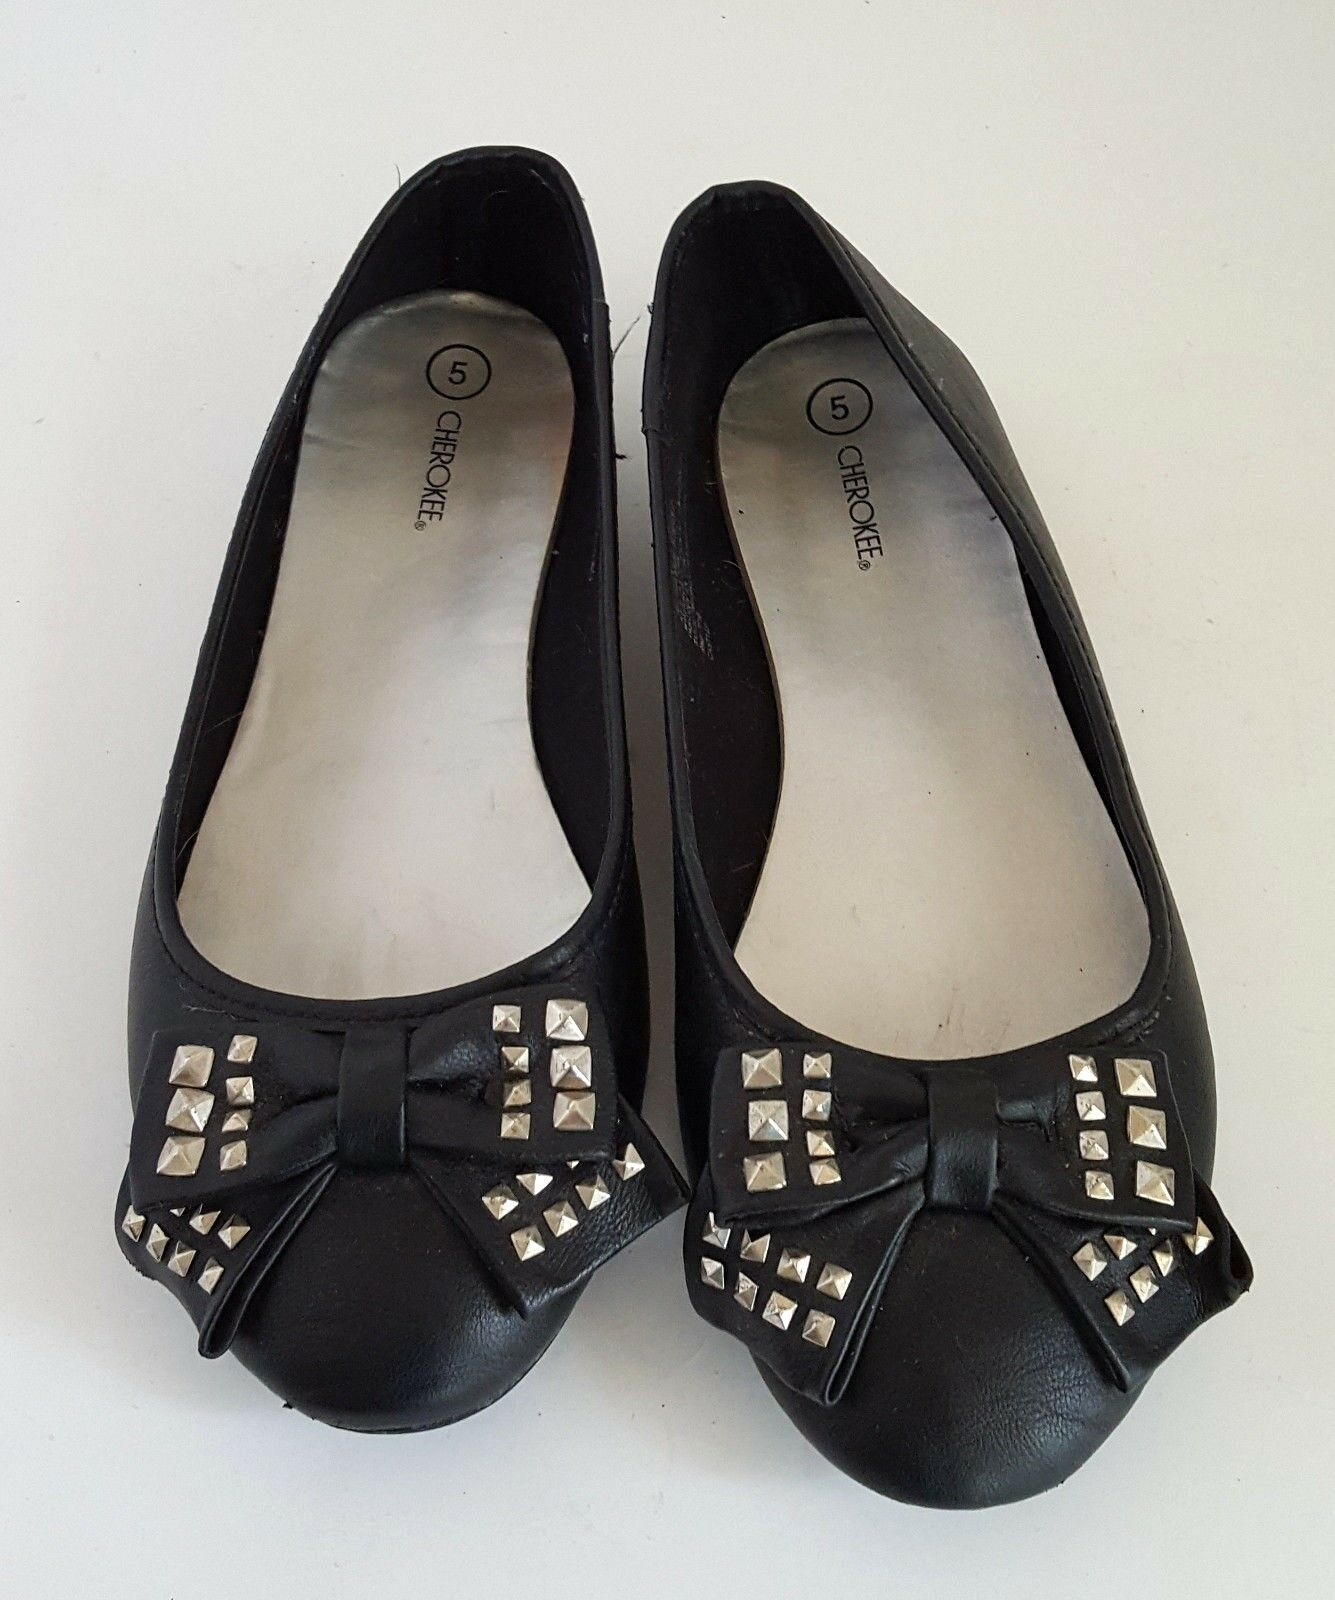 Cherokee Size Design 5 Black Flats Bow Design Size 8ec815